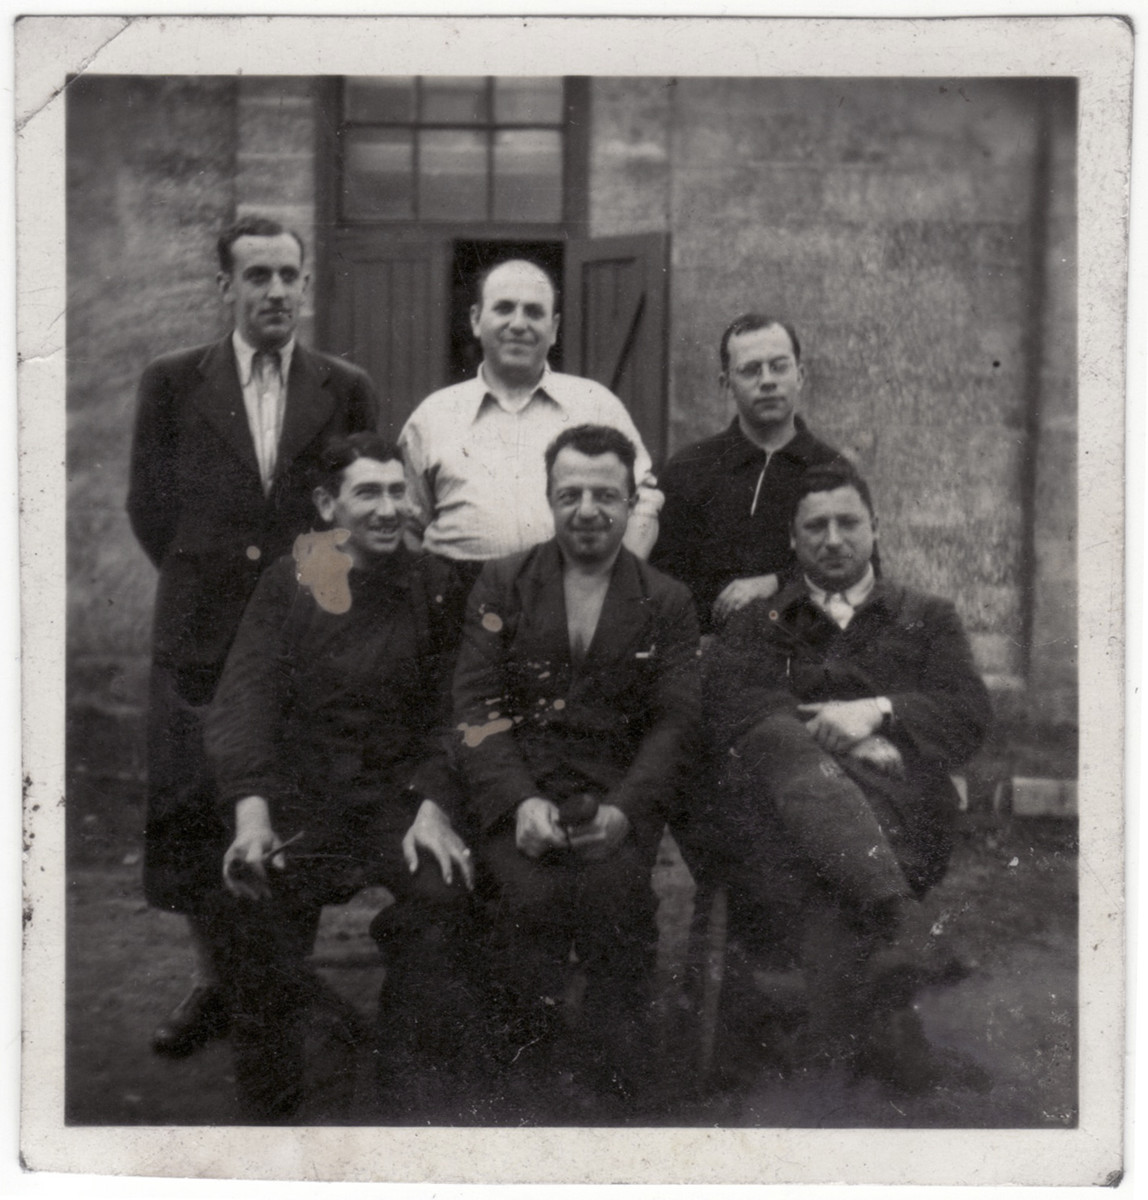 Group portrait of five Jewish men in the Kitchener refugee camp.